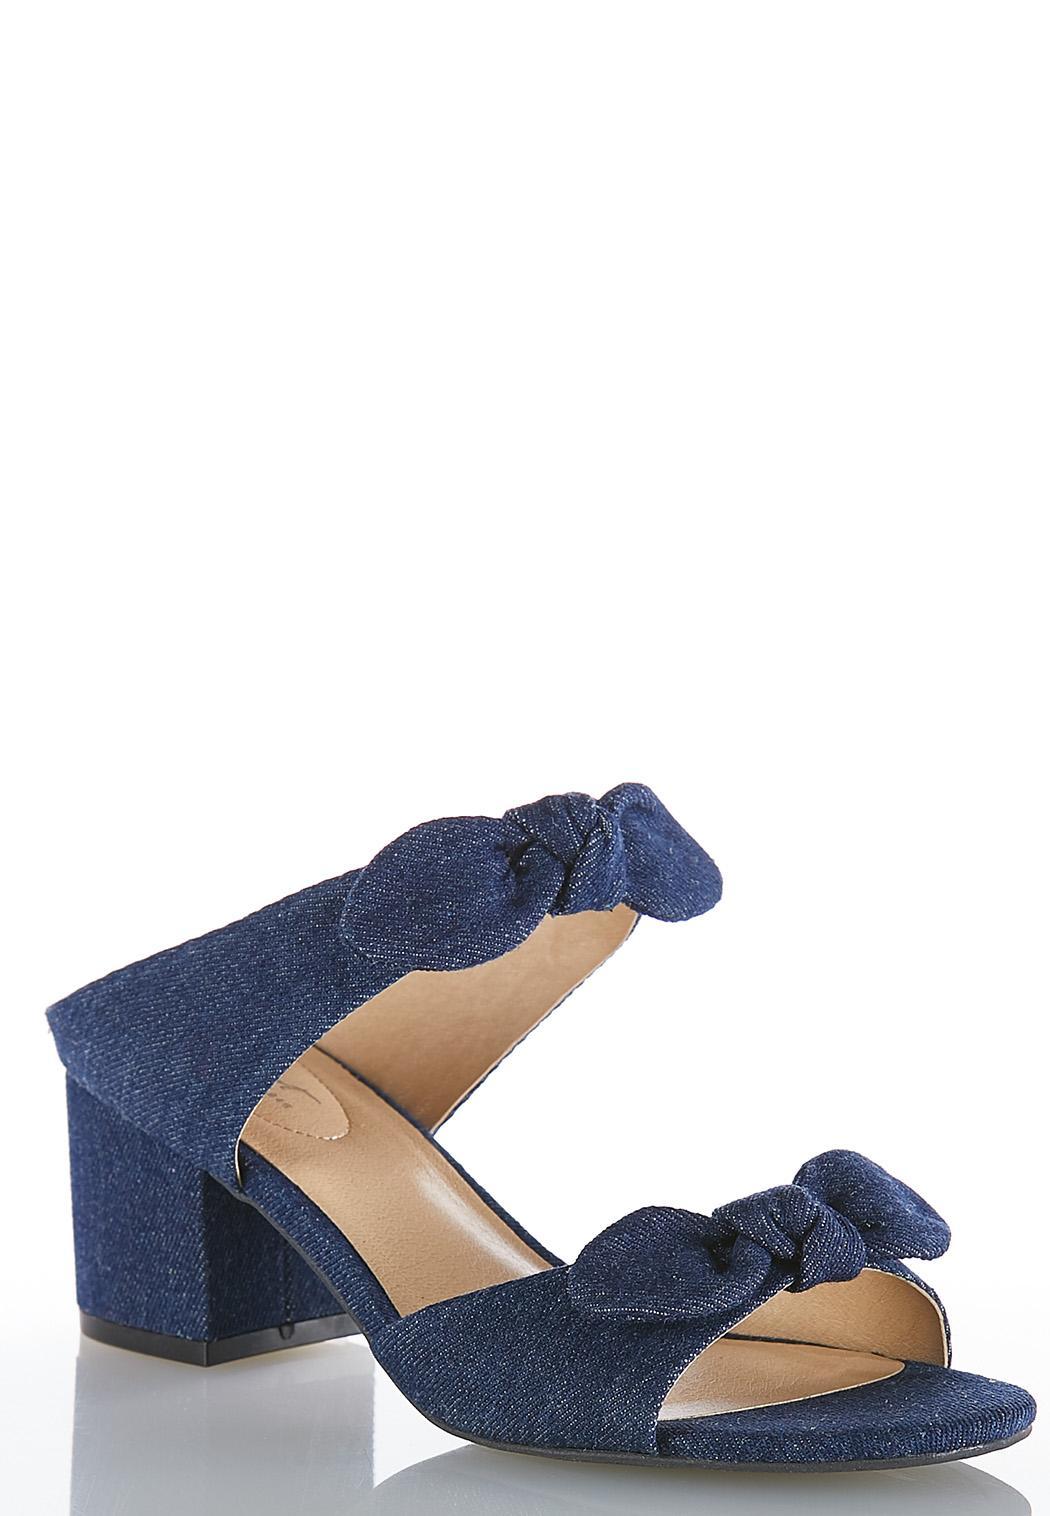 254ab077030 Women s Shoes - Boots